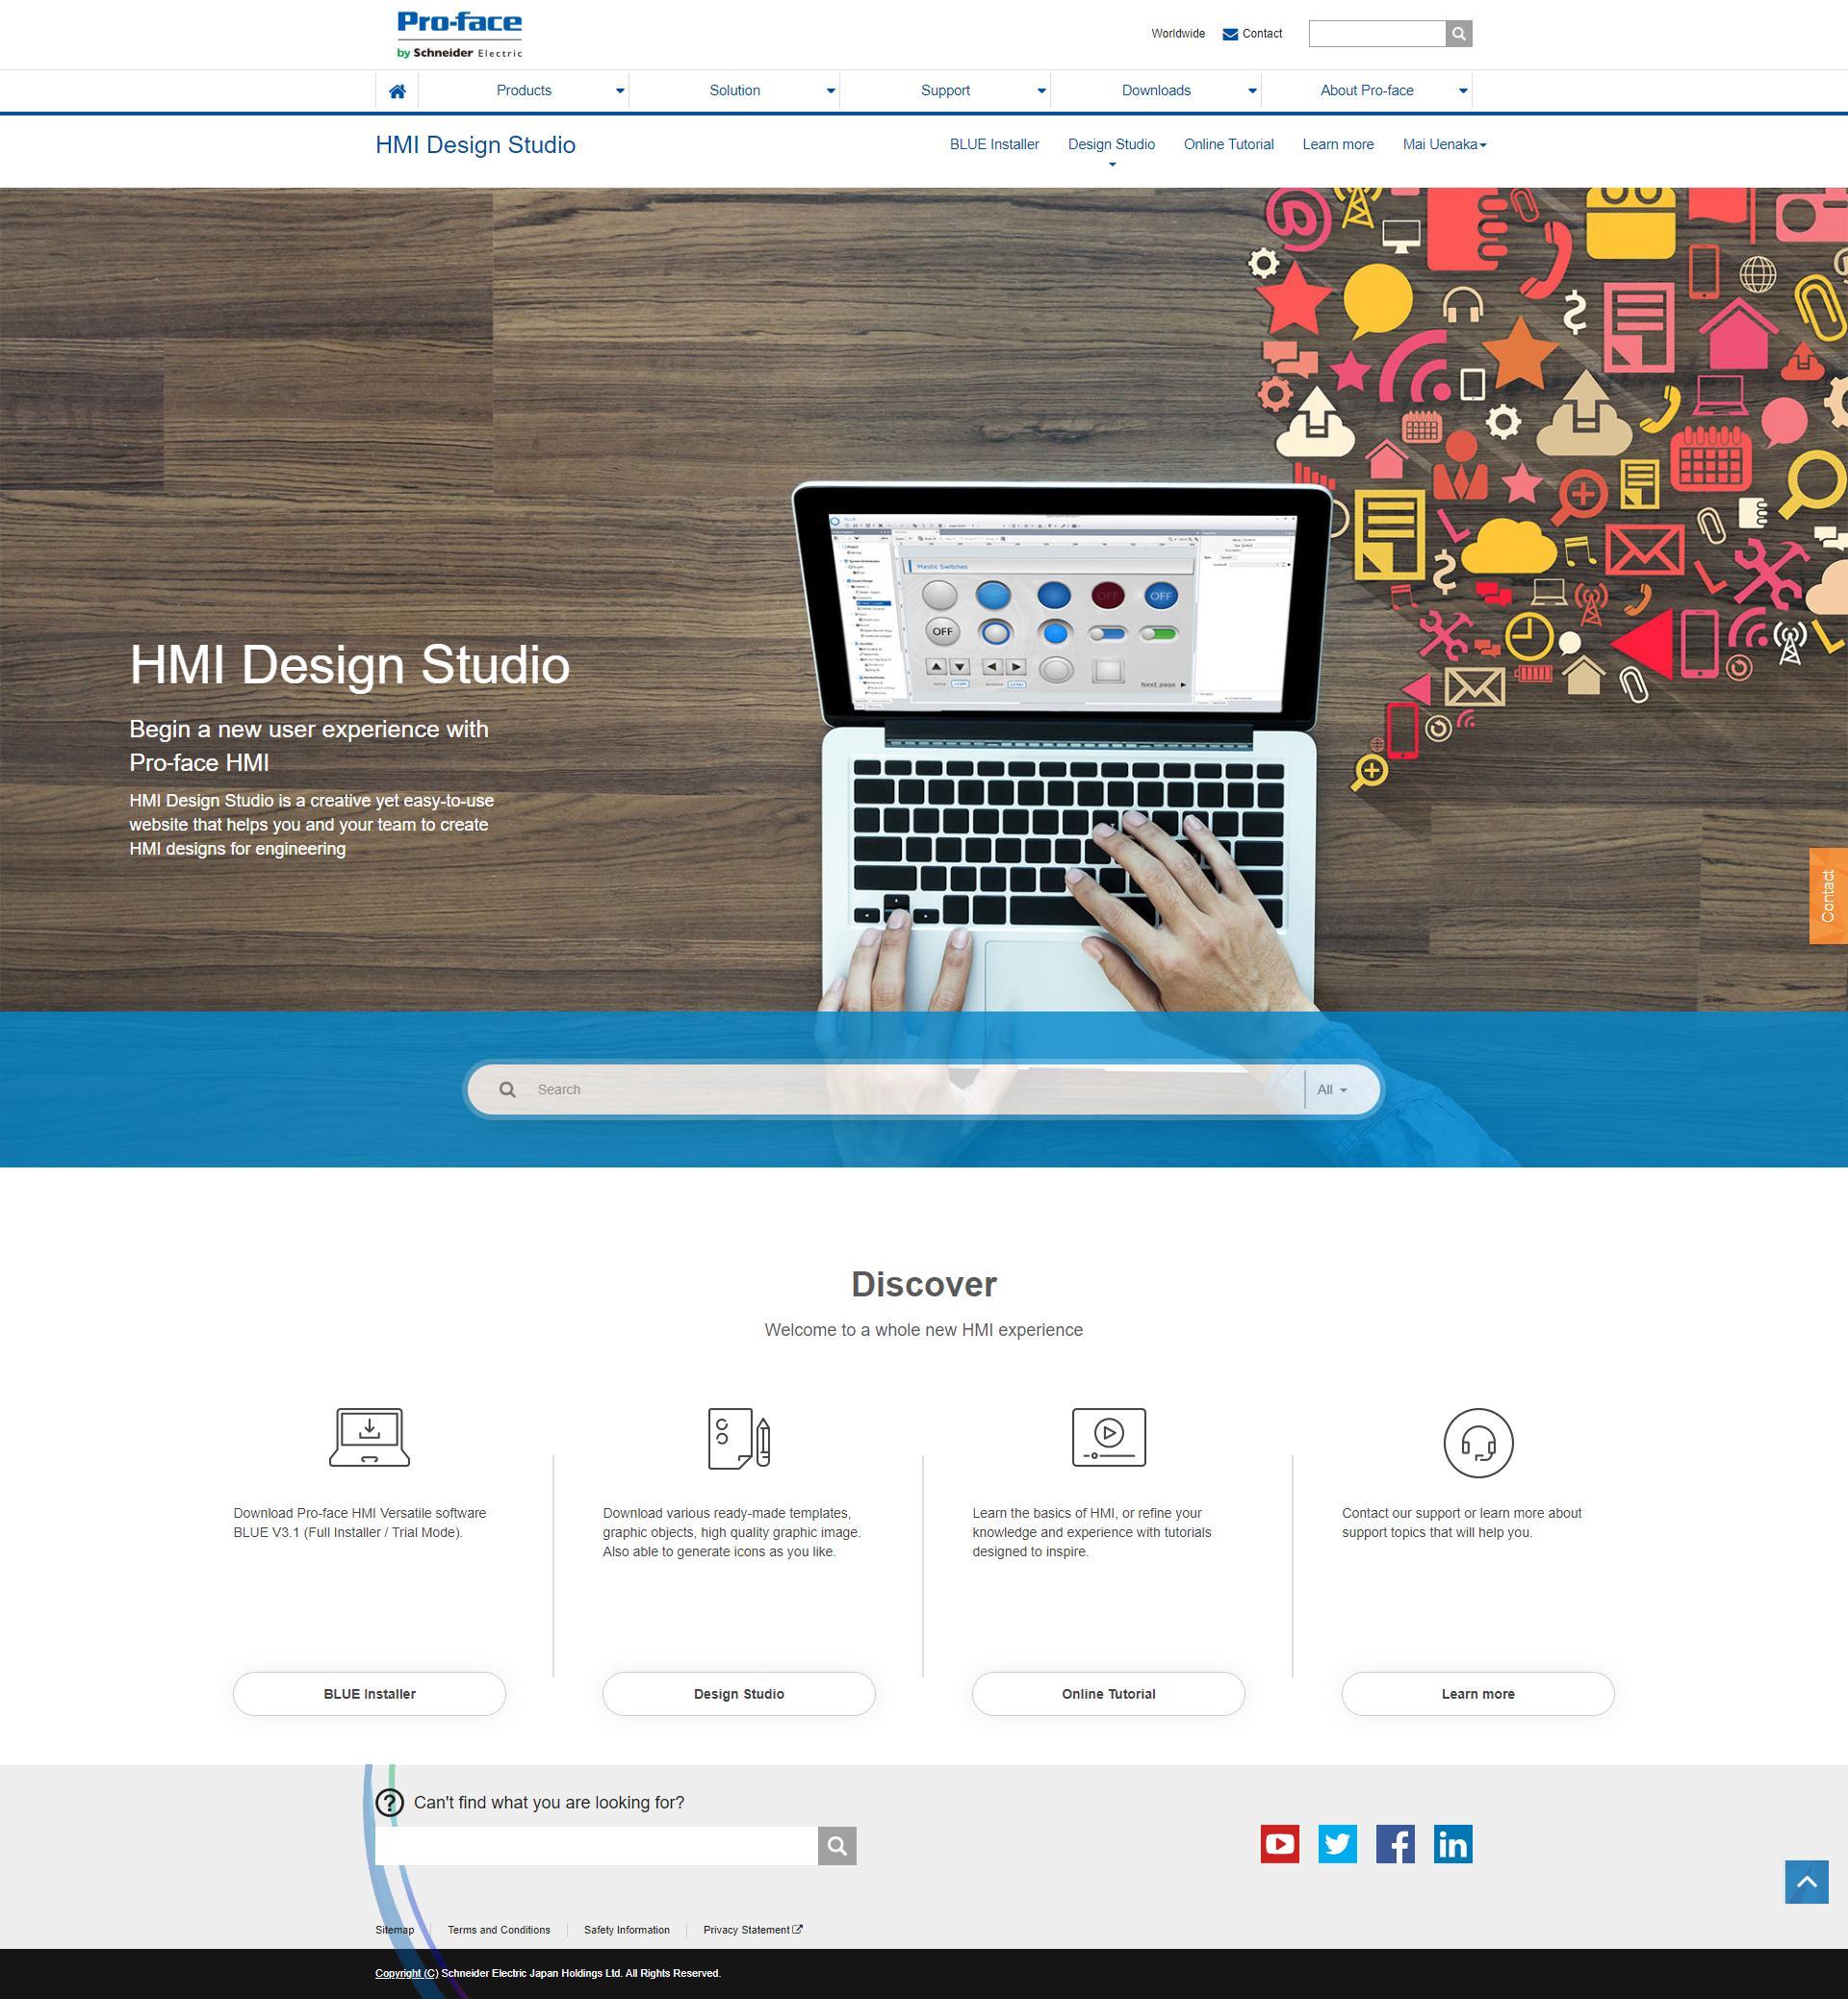 hmi design studio